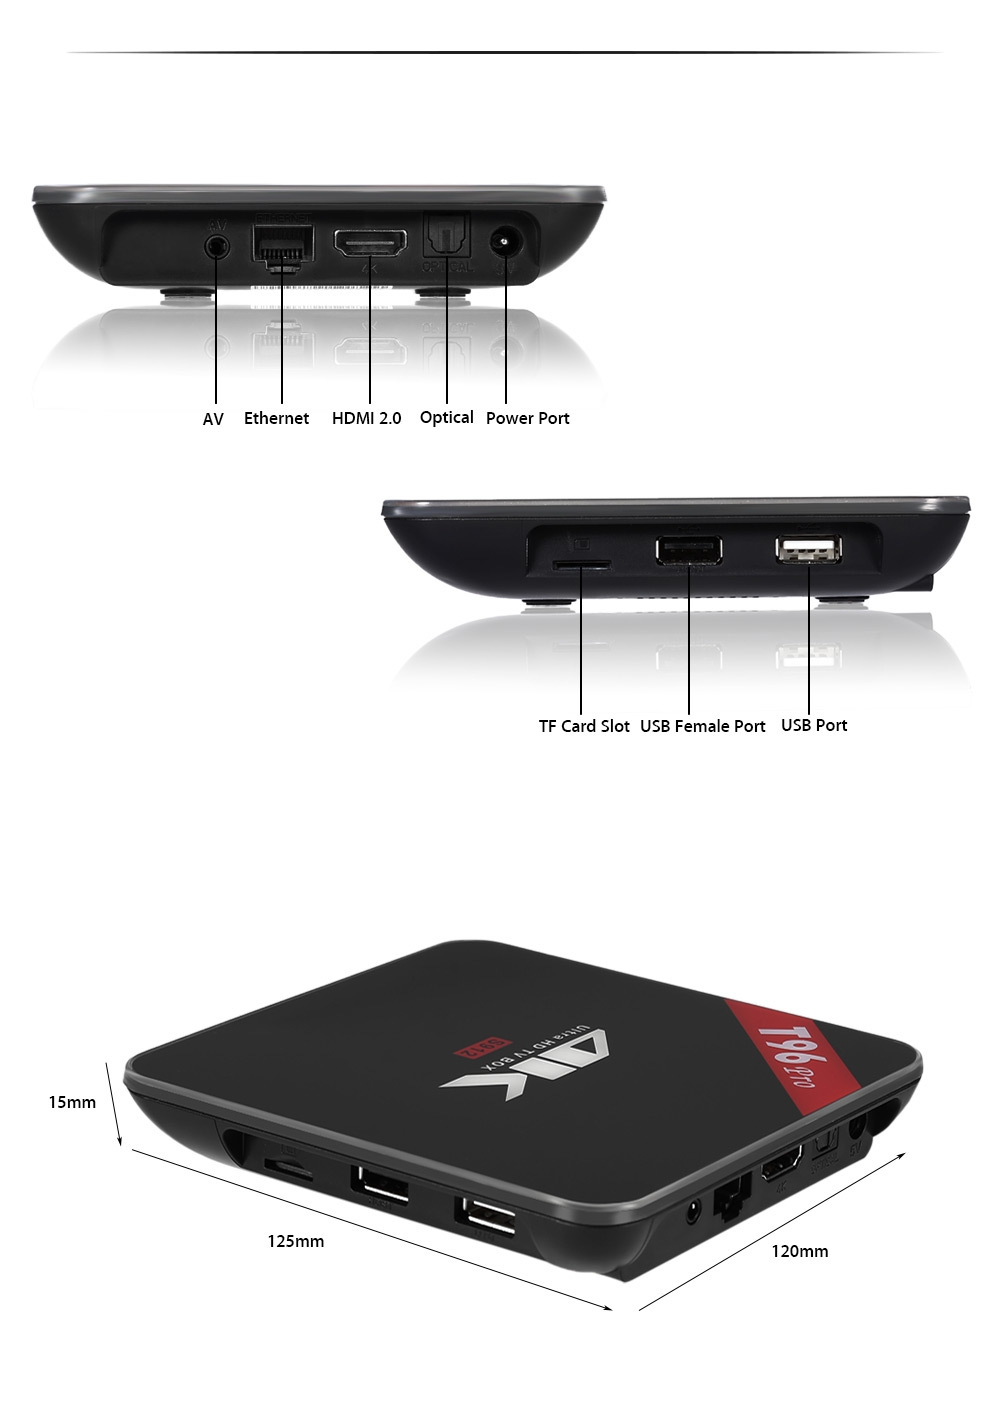 T96 PRO TV Box Amlogic S912 Octa-core Android 6.0 2.4G / 5.0G WiFi Bluetooth 4.1 H.265 Decoding Multi-media Player